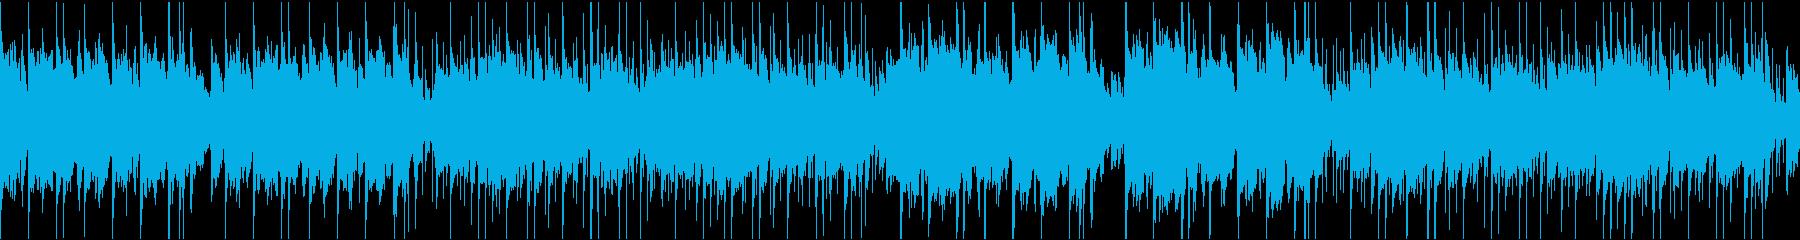 Refreshing violin / loop's reproduced waveform